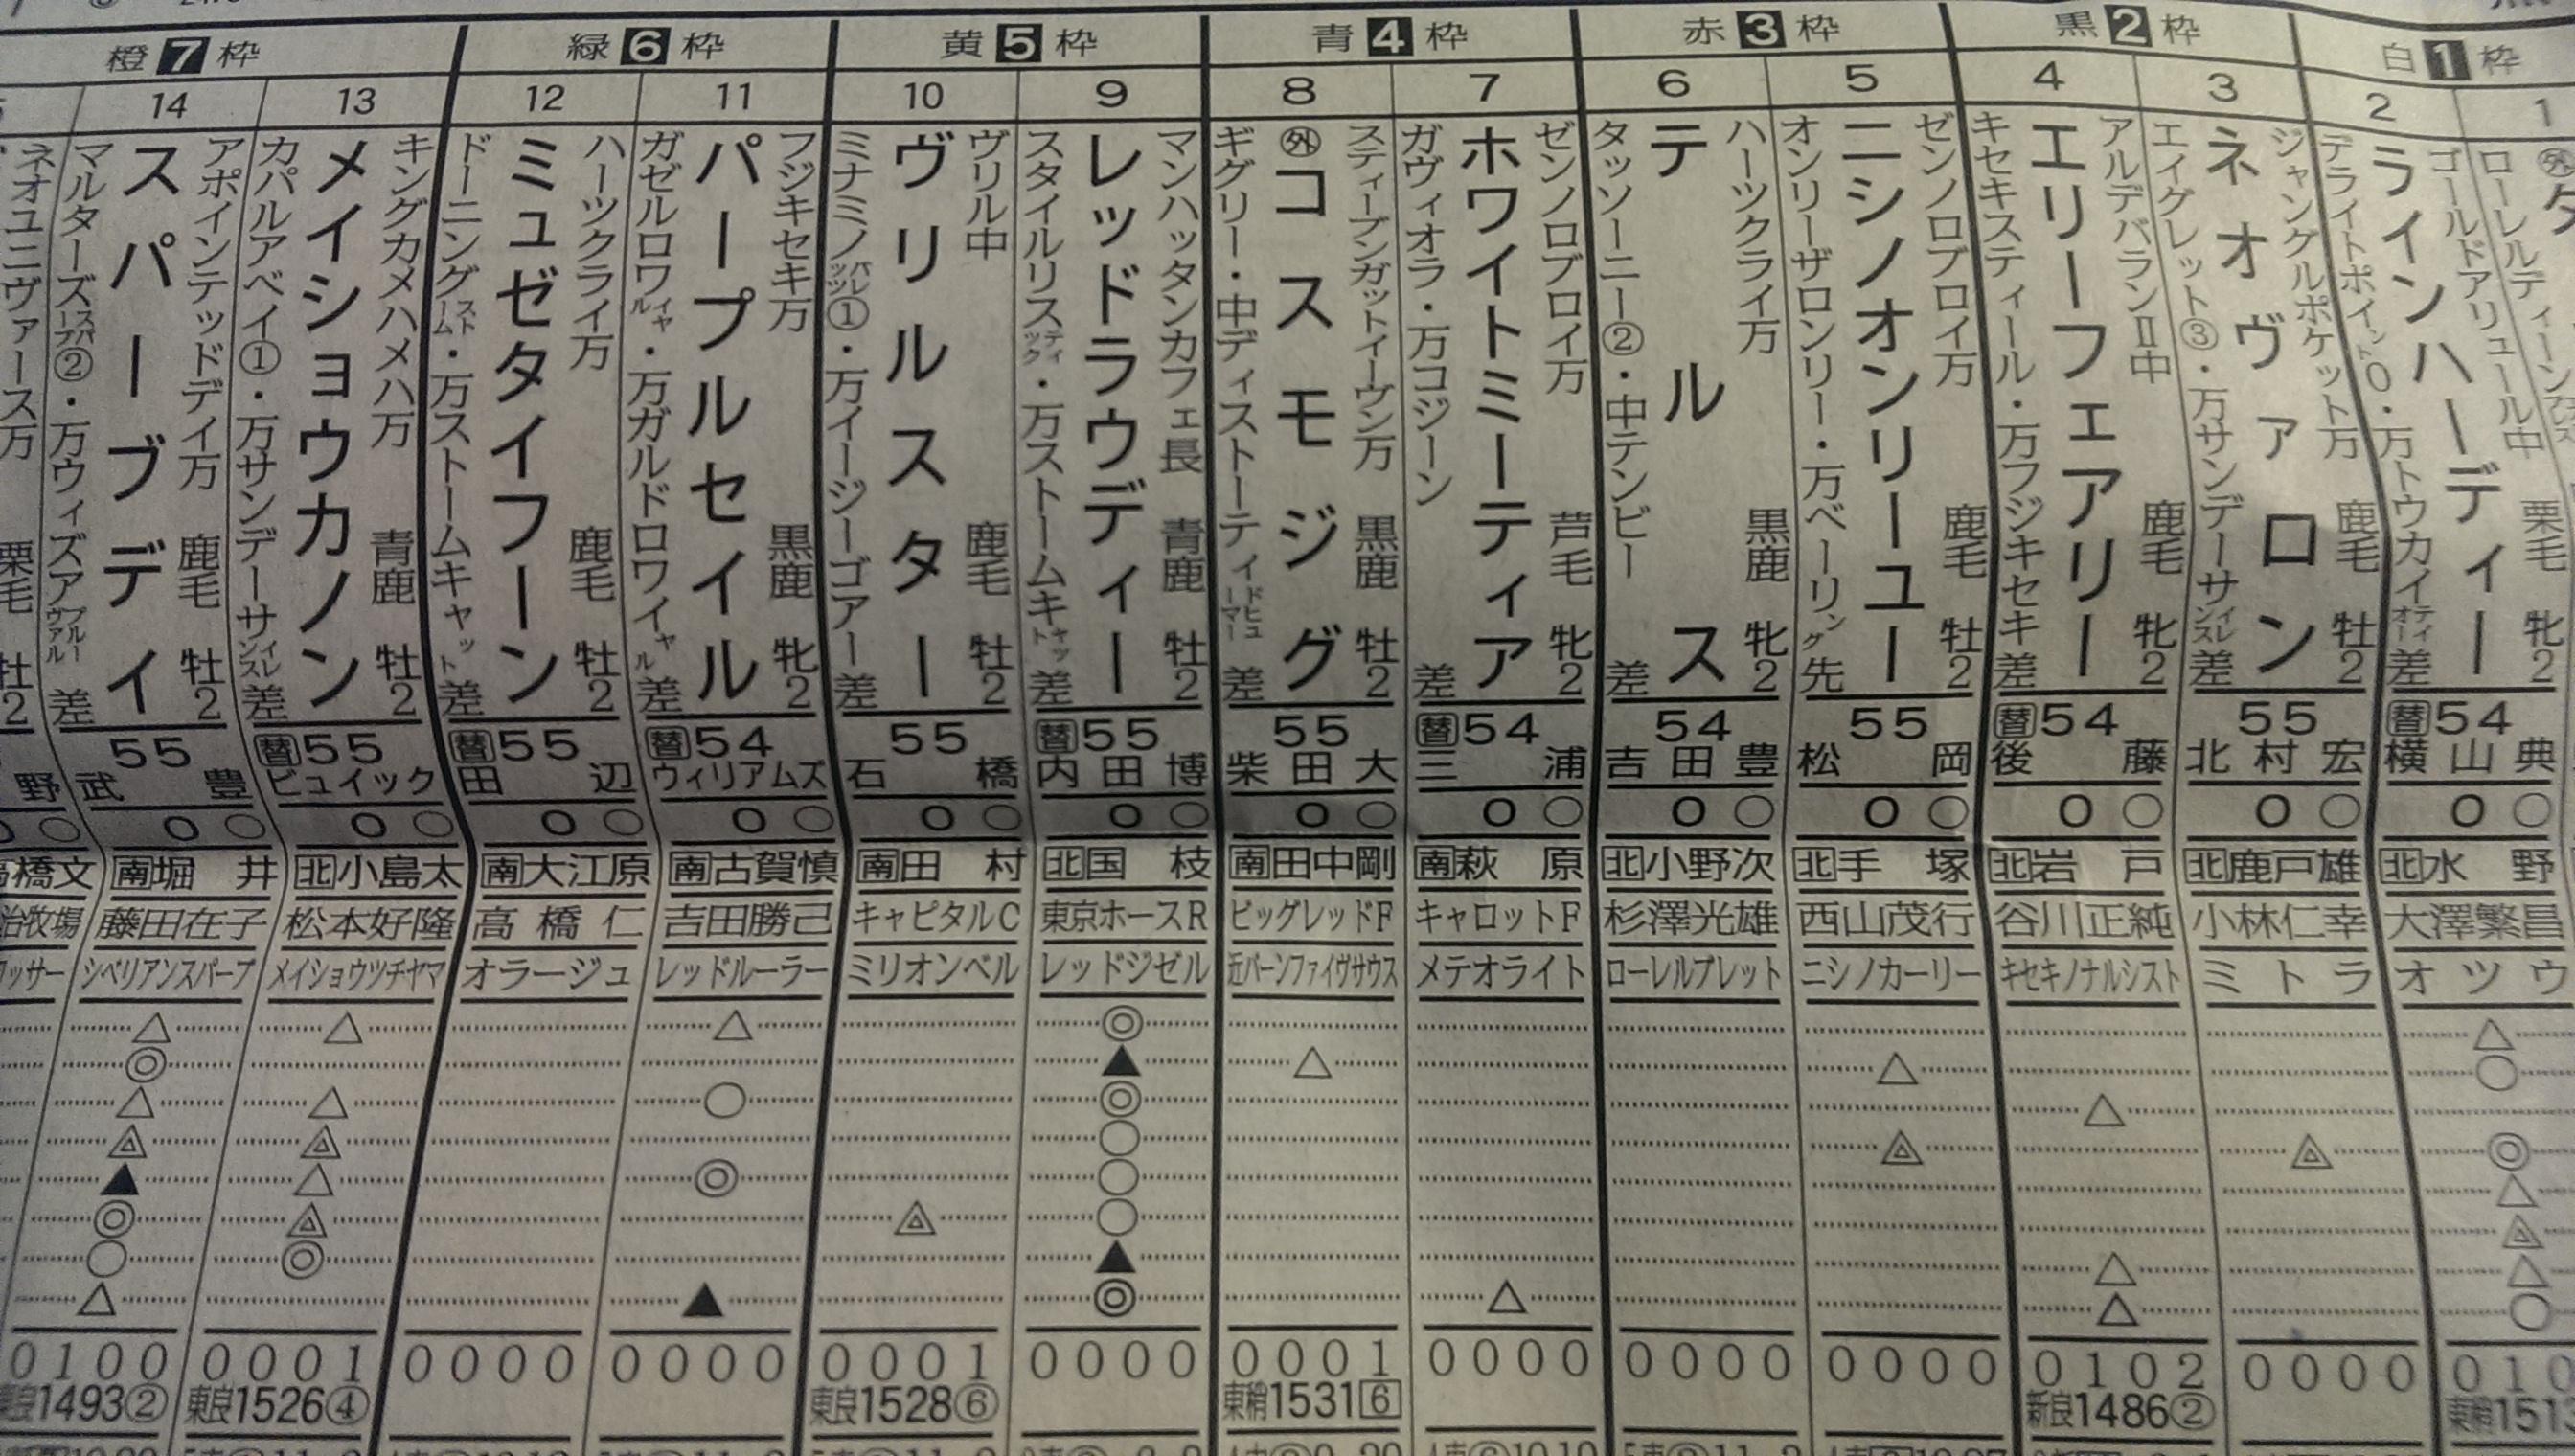 20131124rowdy-wakujun.jpg